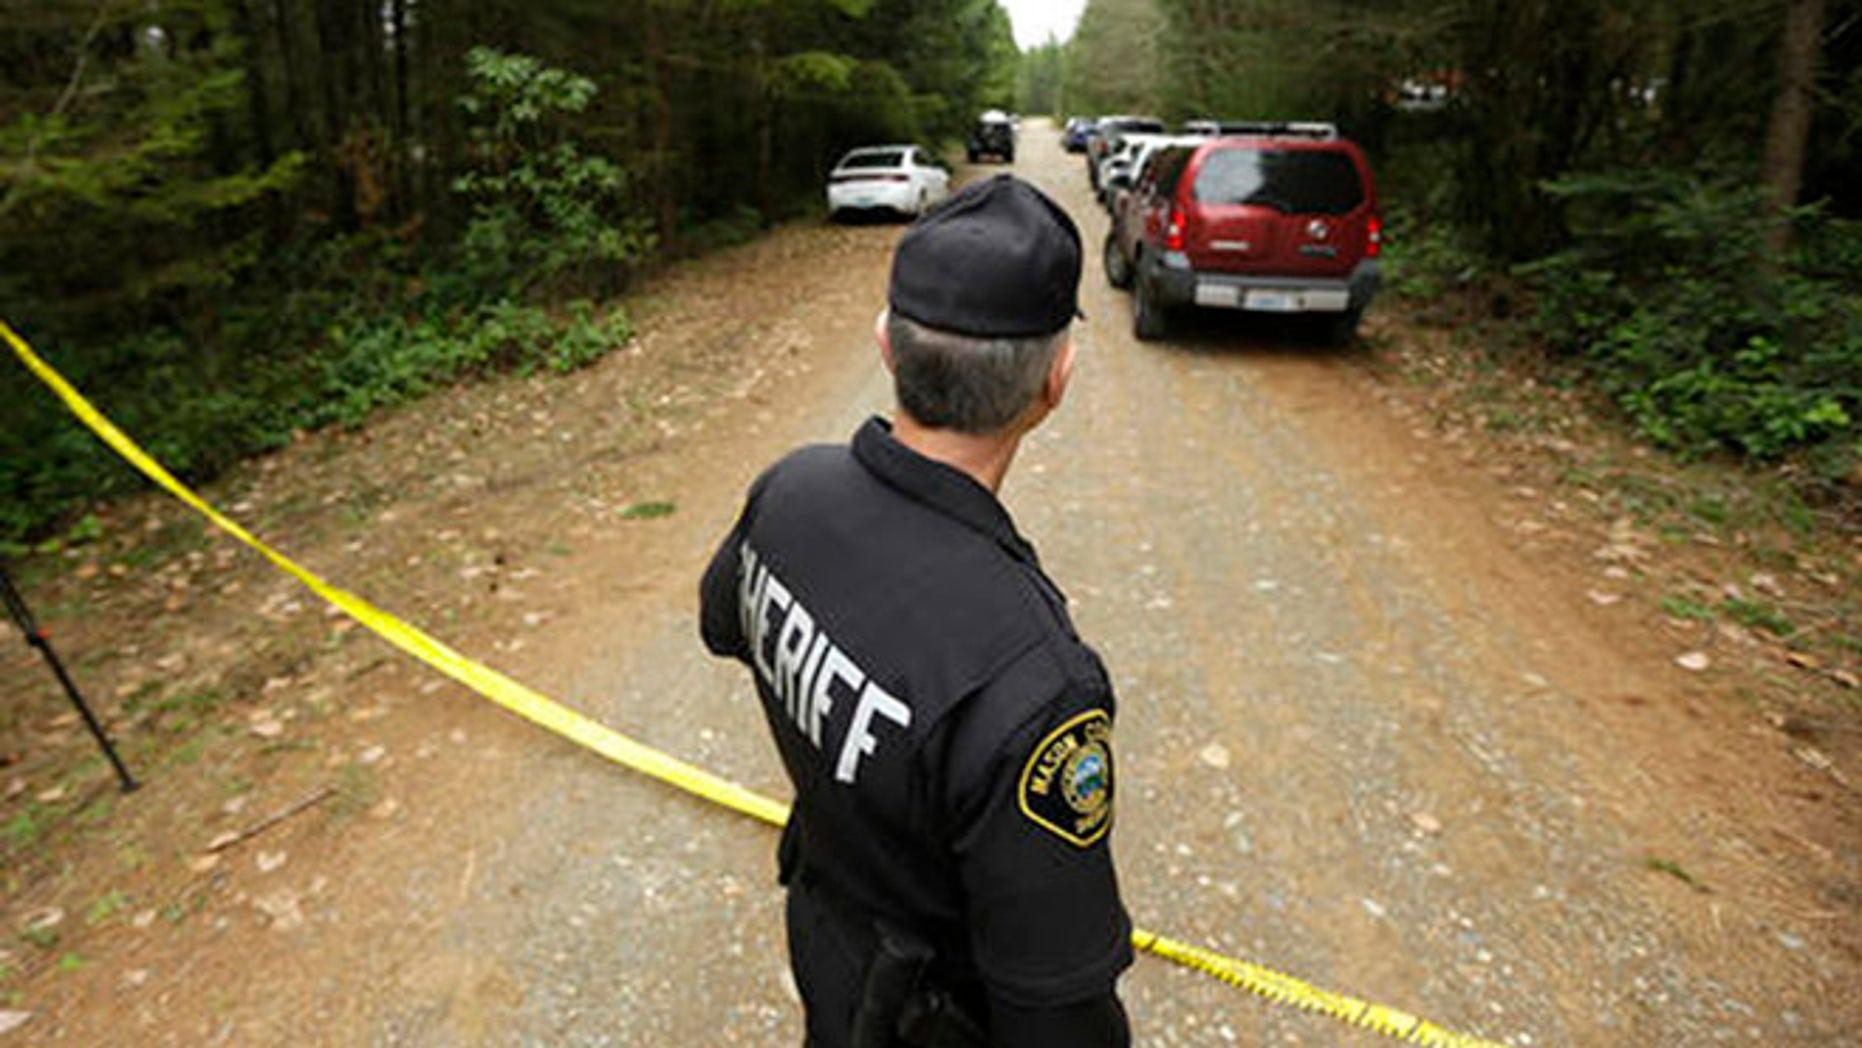 Mason County Sheriff's Chief Criminal Deputy Russ Osterhout looks down a road near the scene of a fatal shooting Friday, Feb. 26, 2016, near Belfair, Wash. (AP Photo/Ted S. Warren)